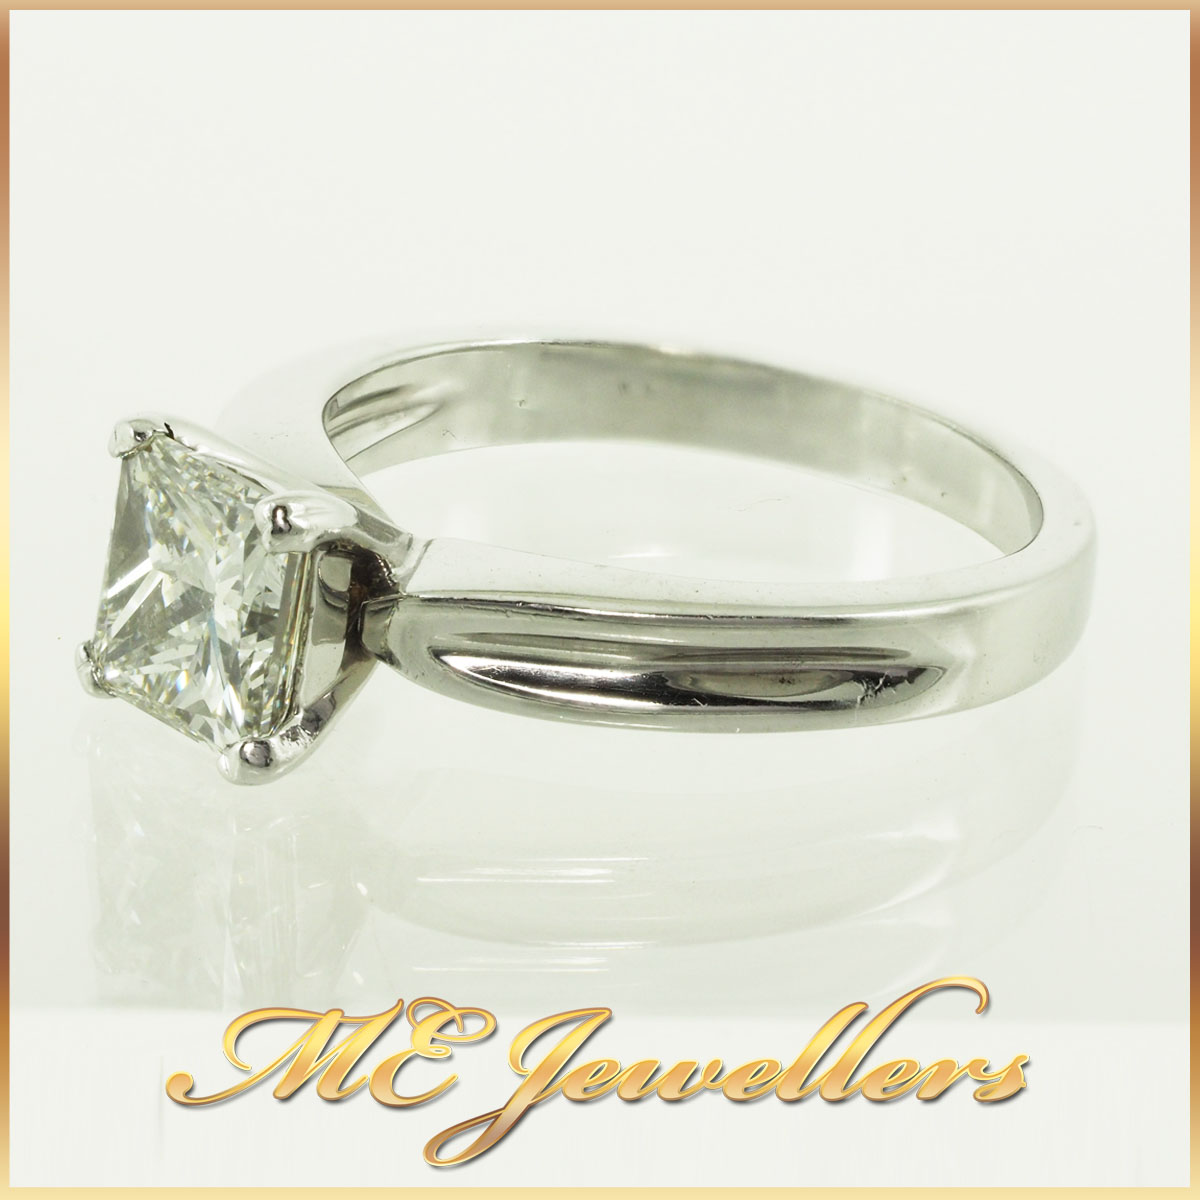 287 1.09Ct K/SI1 Princess Cut Engagement Ring 1